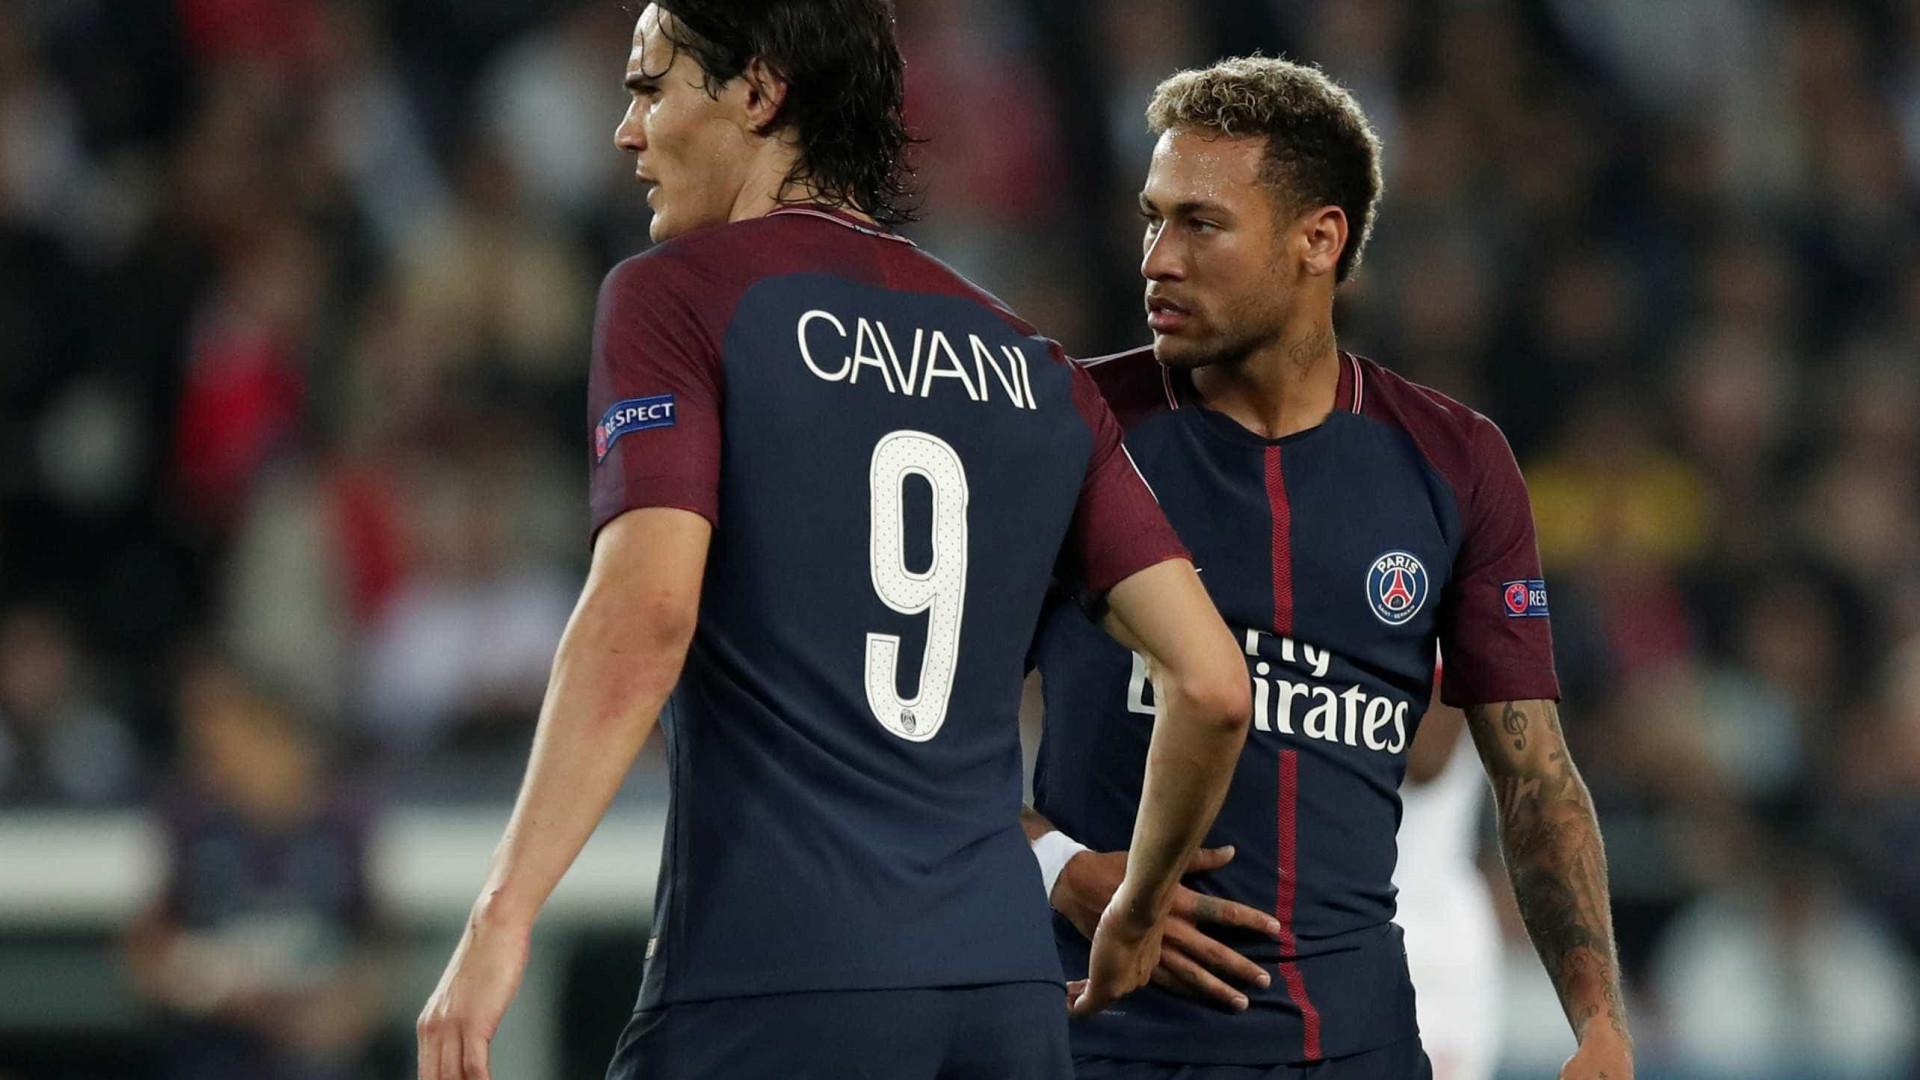 Cavani minimiza briga com Neymar: 'Tudo tem solução'